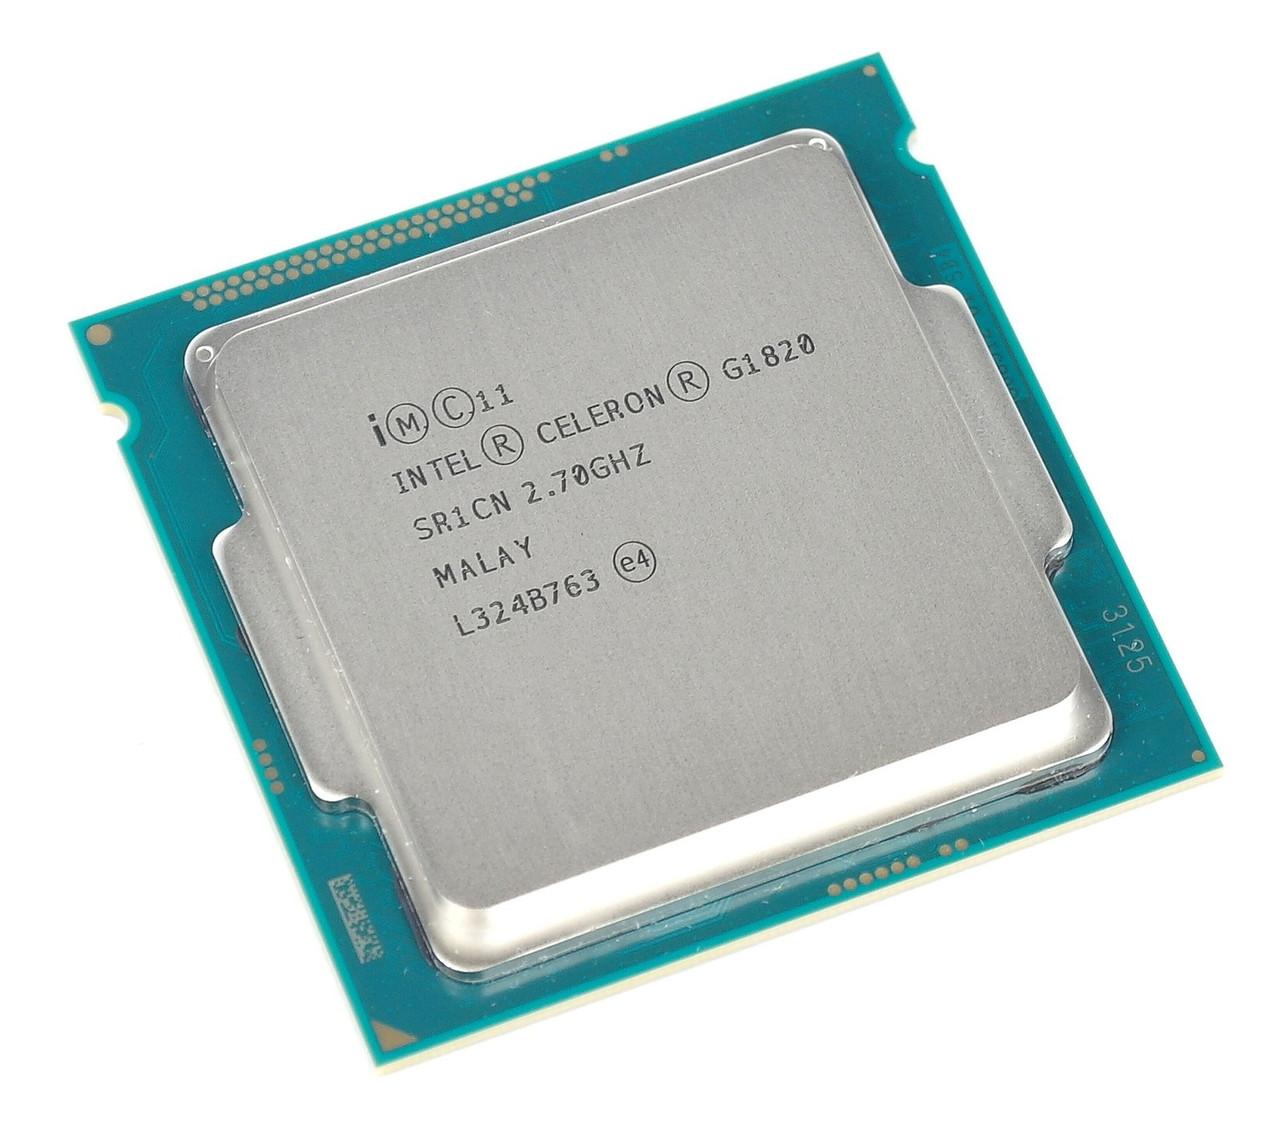 Процессор Intel Celeron G1820 BX80646G1820 2.7GHz Socket 1150 Tray Б/У